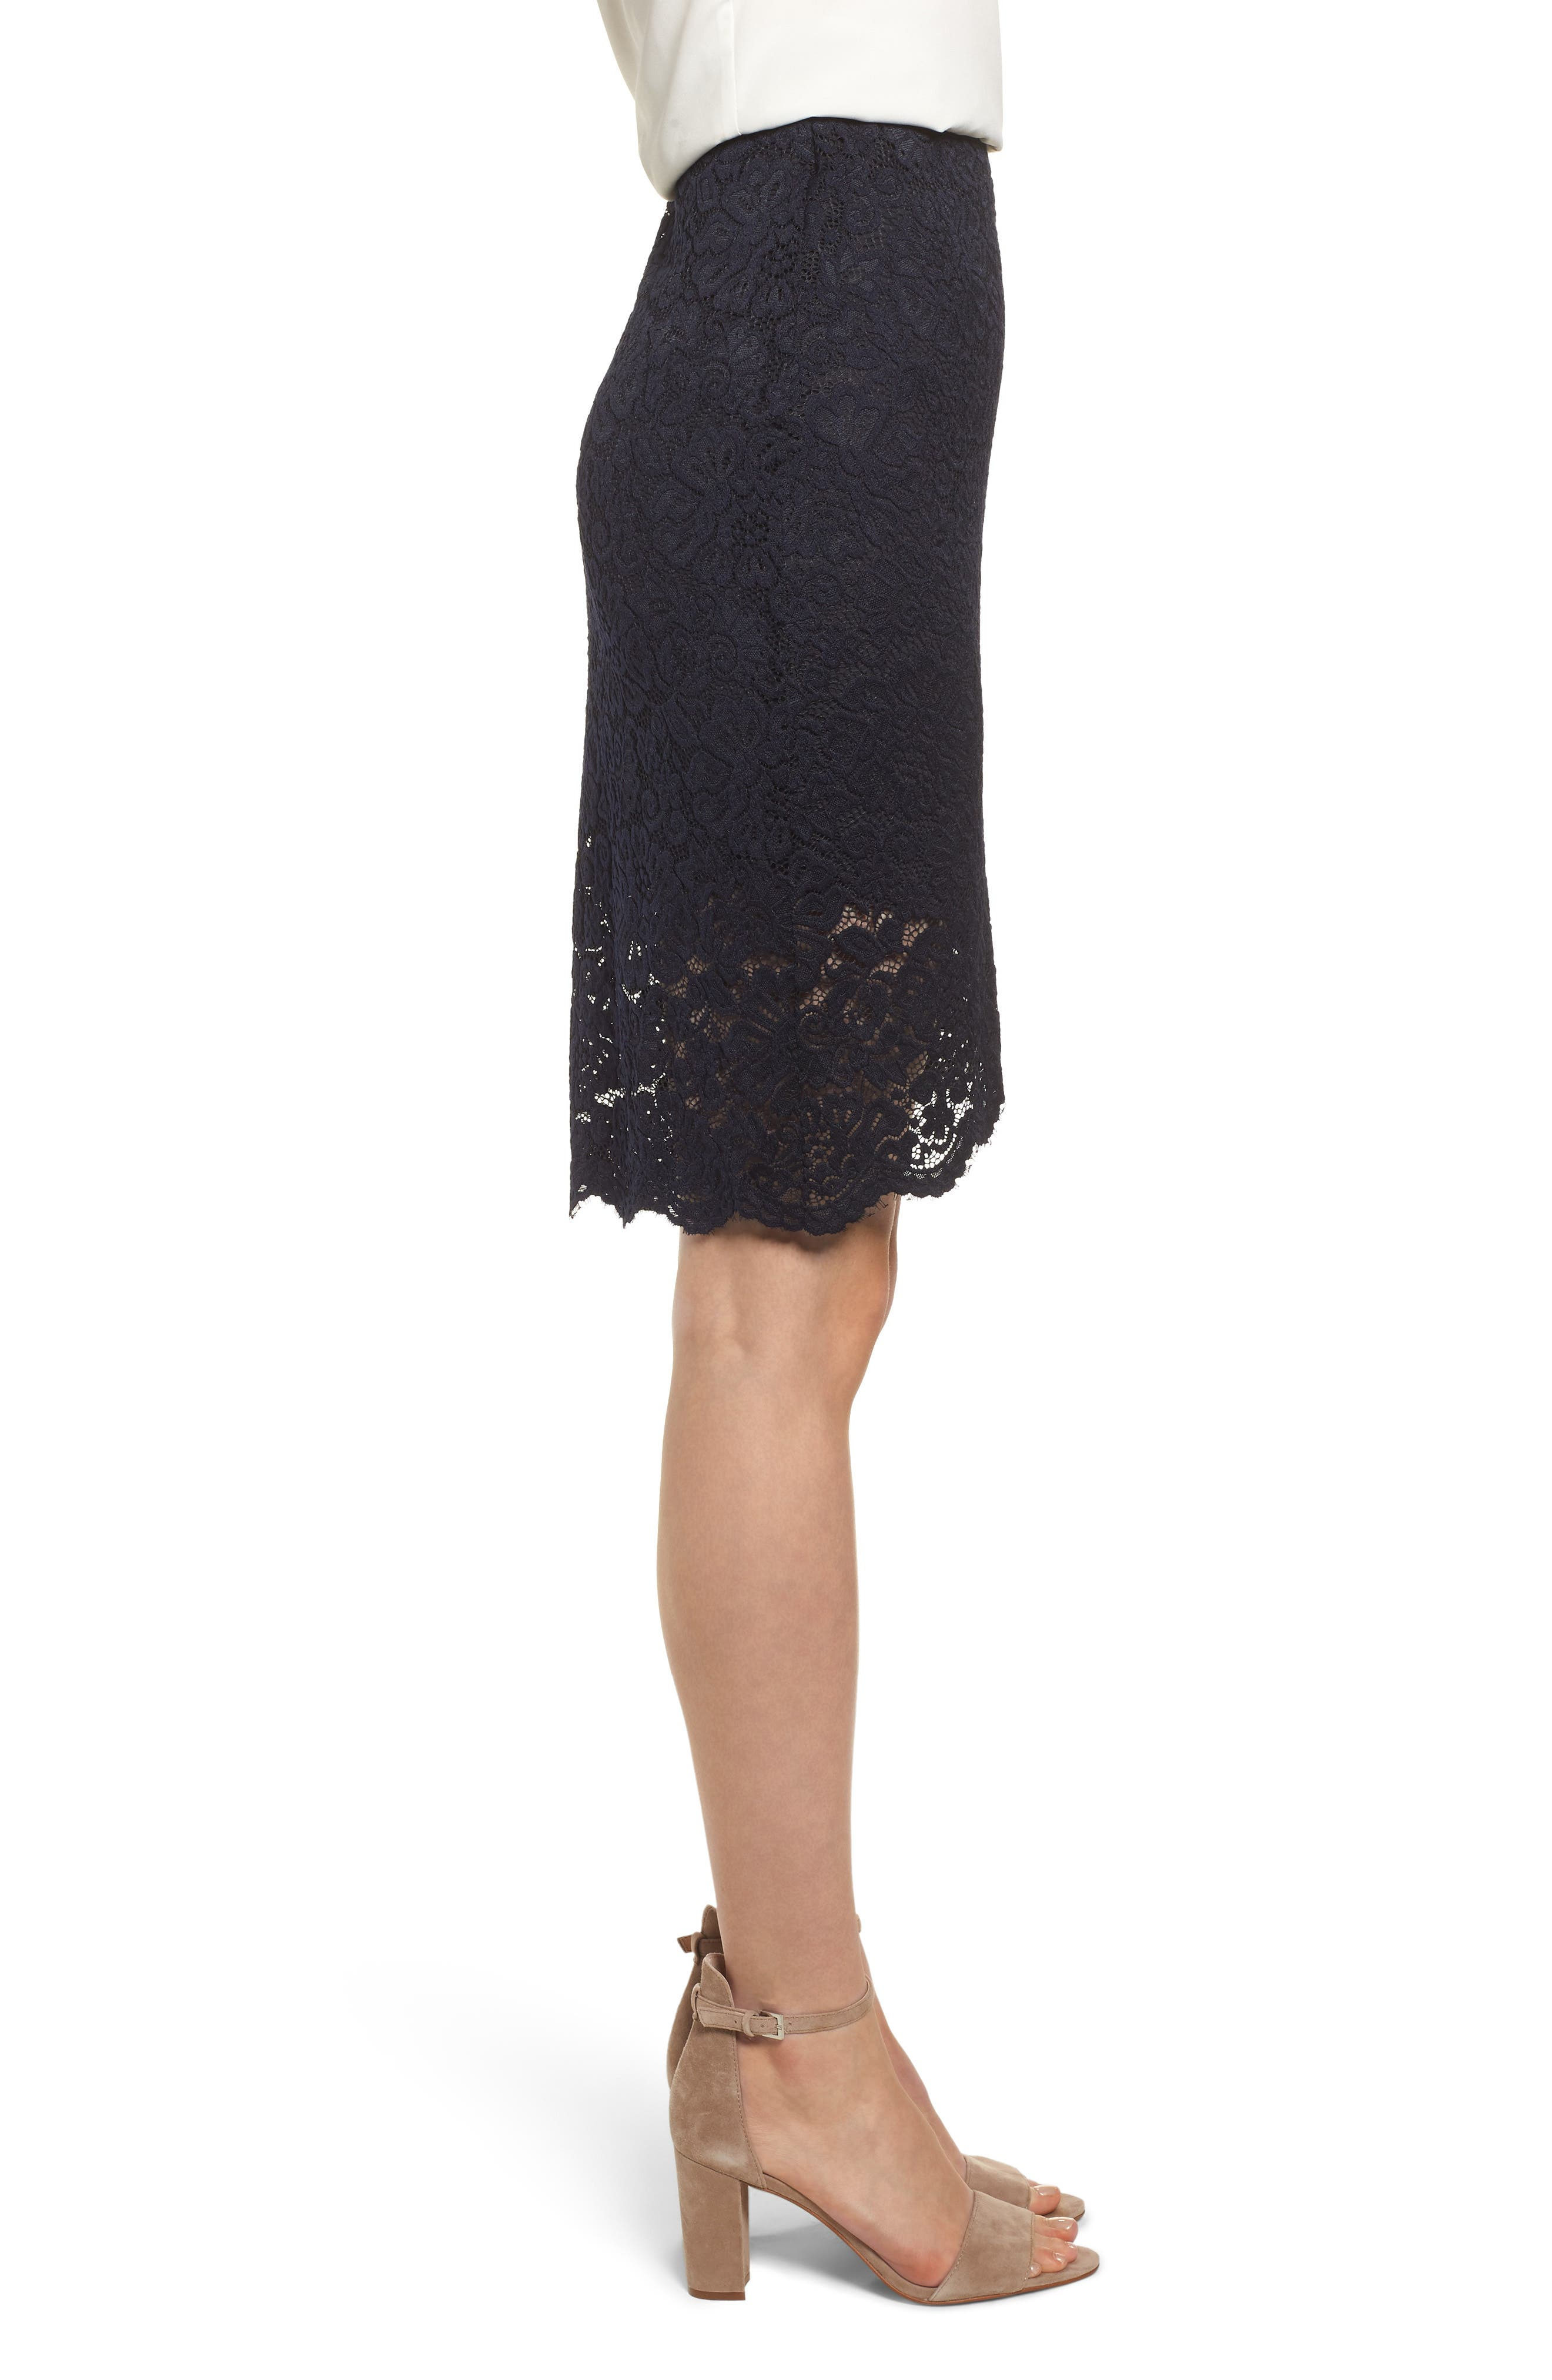 ROSEMUNDE, Lace Pencil Skirt, Alternate thumbnail 3, color, 001